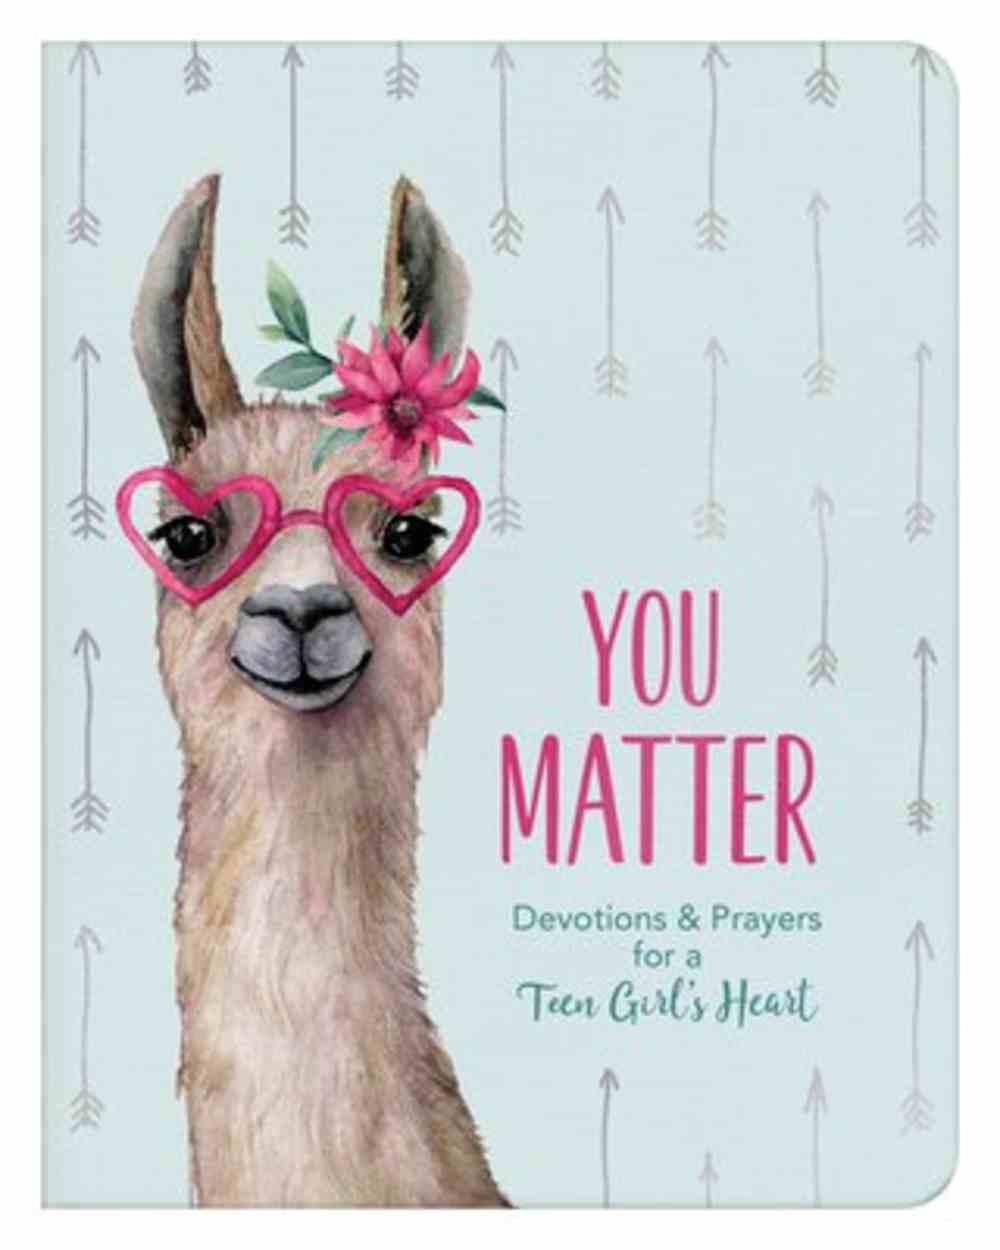 You Matter: Devotions & Prayers For a Teen Girl's Heart (For Teen Girls) Paperback